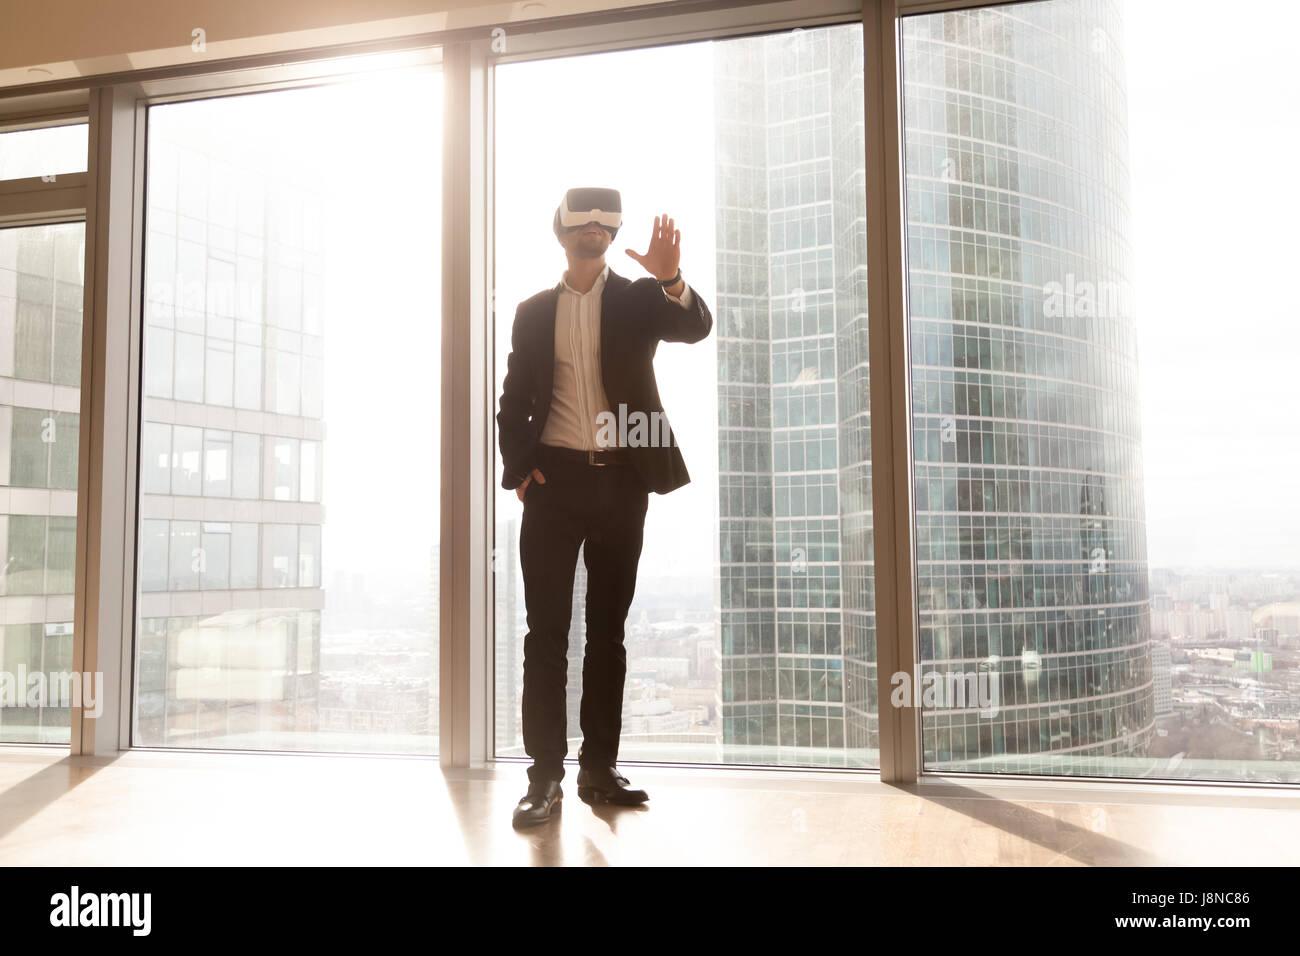 Hombre en auricular VR goza de visualización 3D interior Imagen De Stock